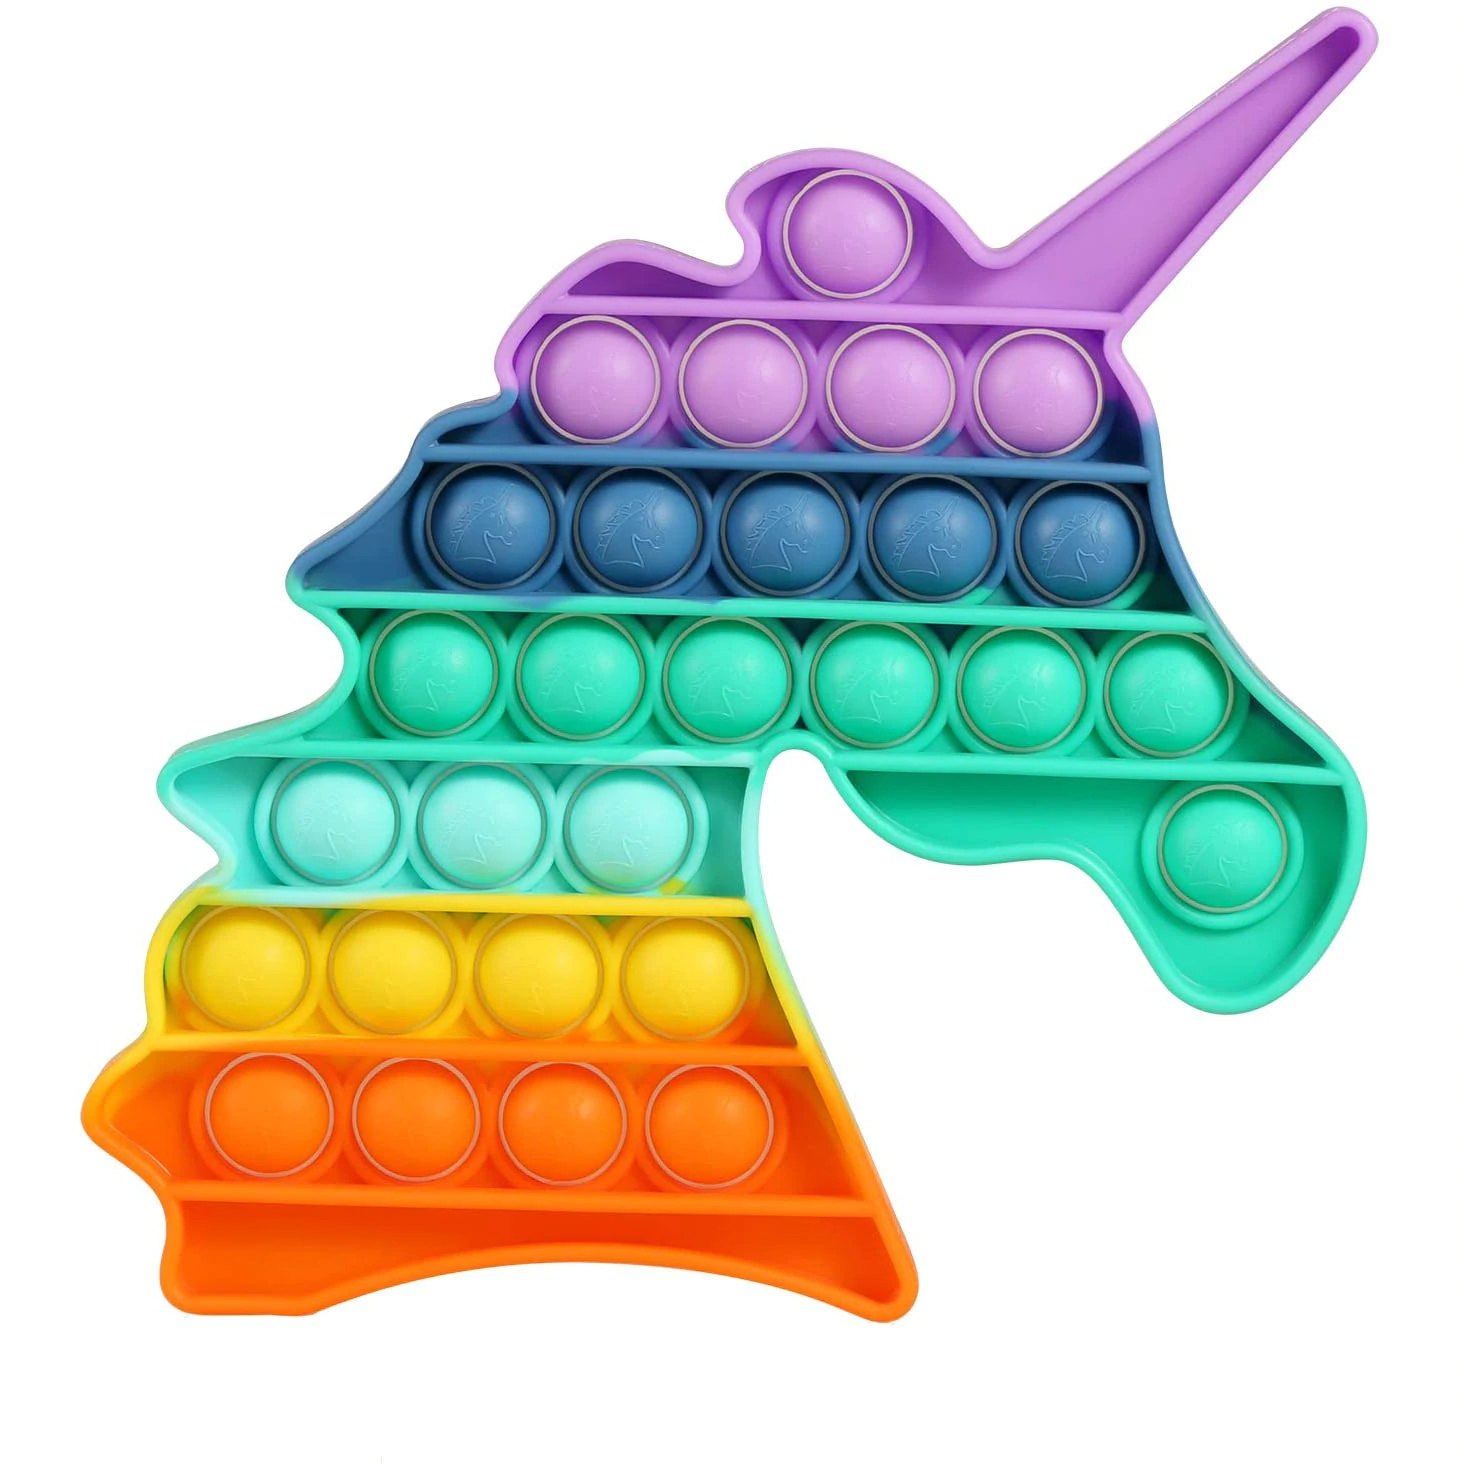 Jucarie antistres din silicon JAF®, Pop it now, forma unicorn, 21x12.5x1.5 cm, multicolor